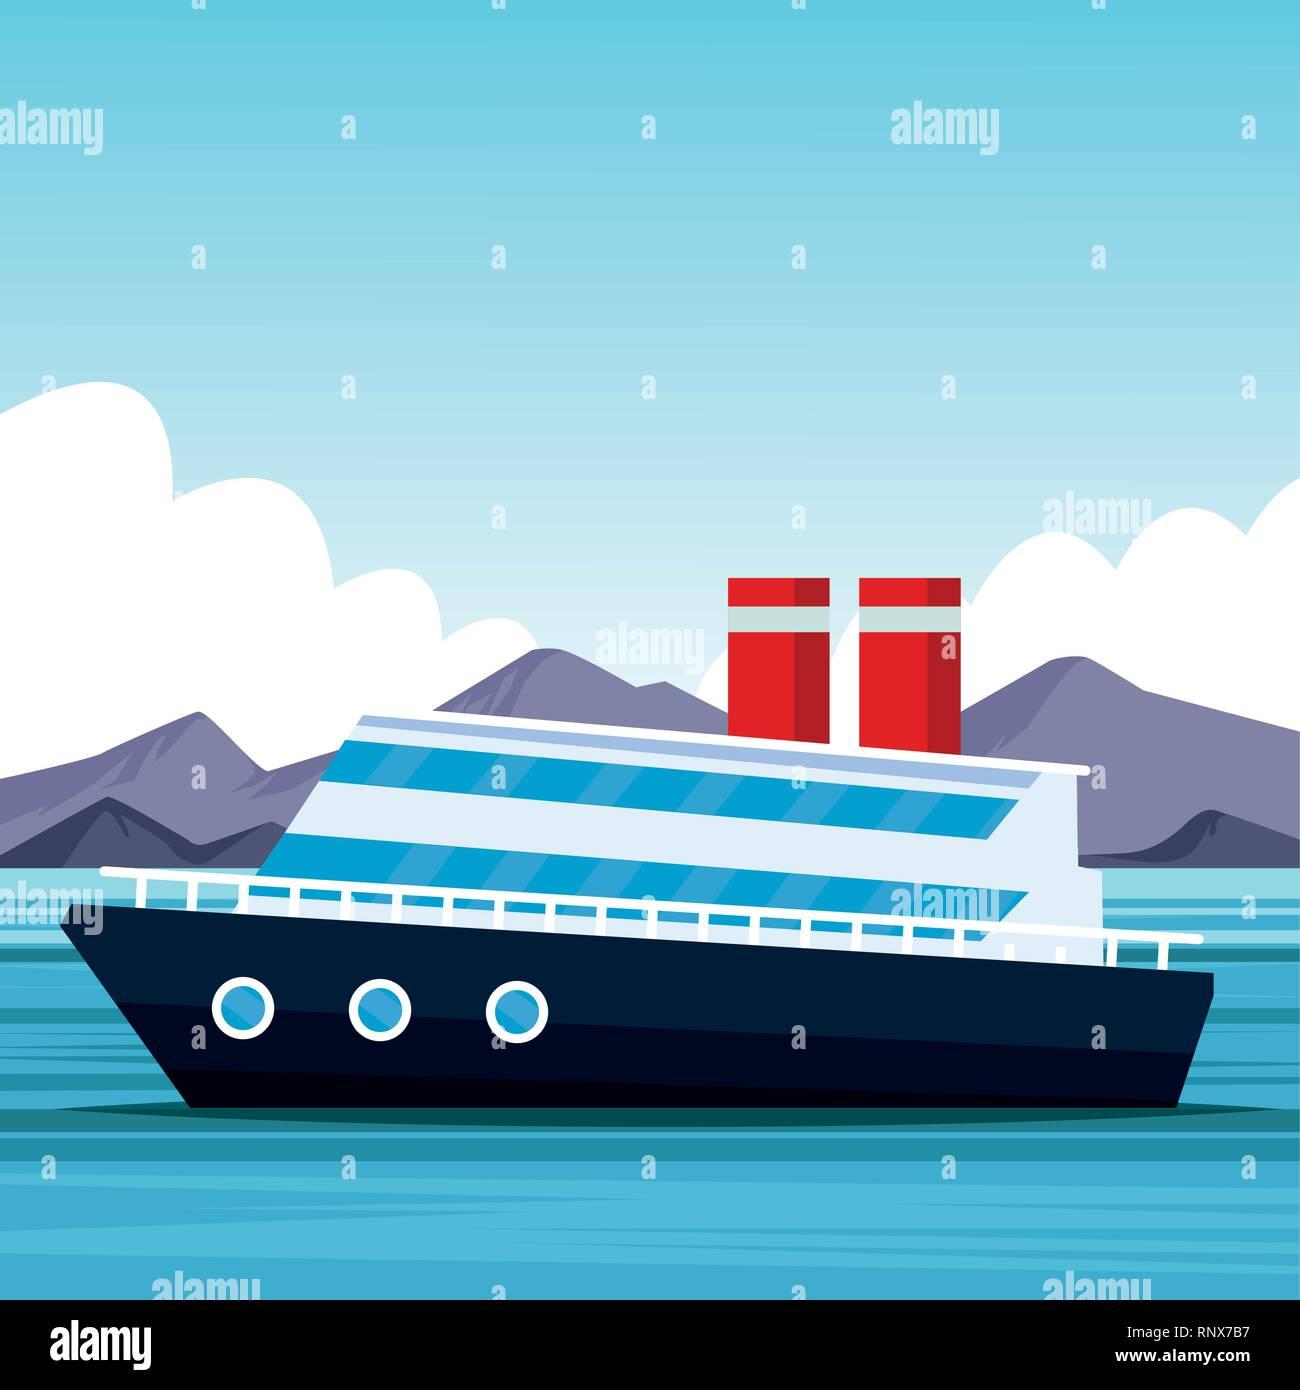 Cruise Ship Cartoon Stock Vector Image Art Alamy